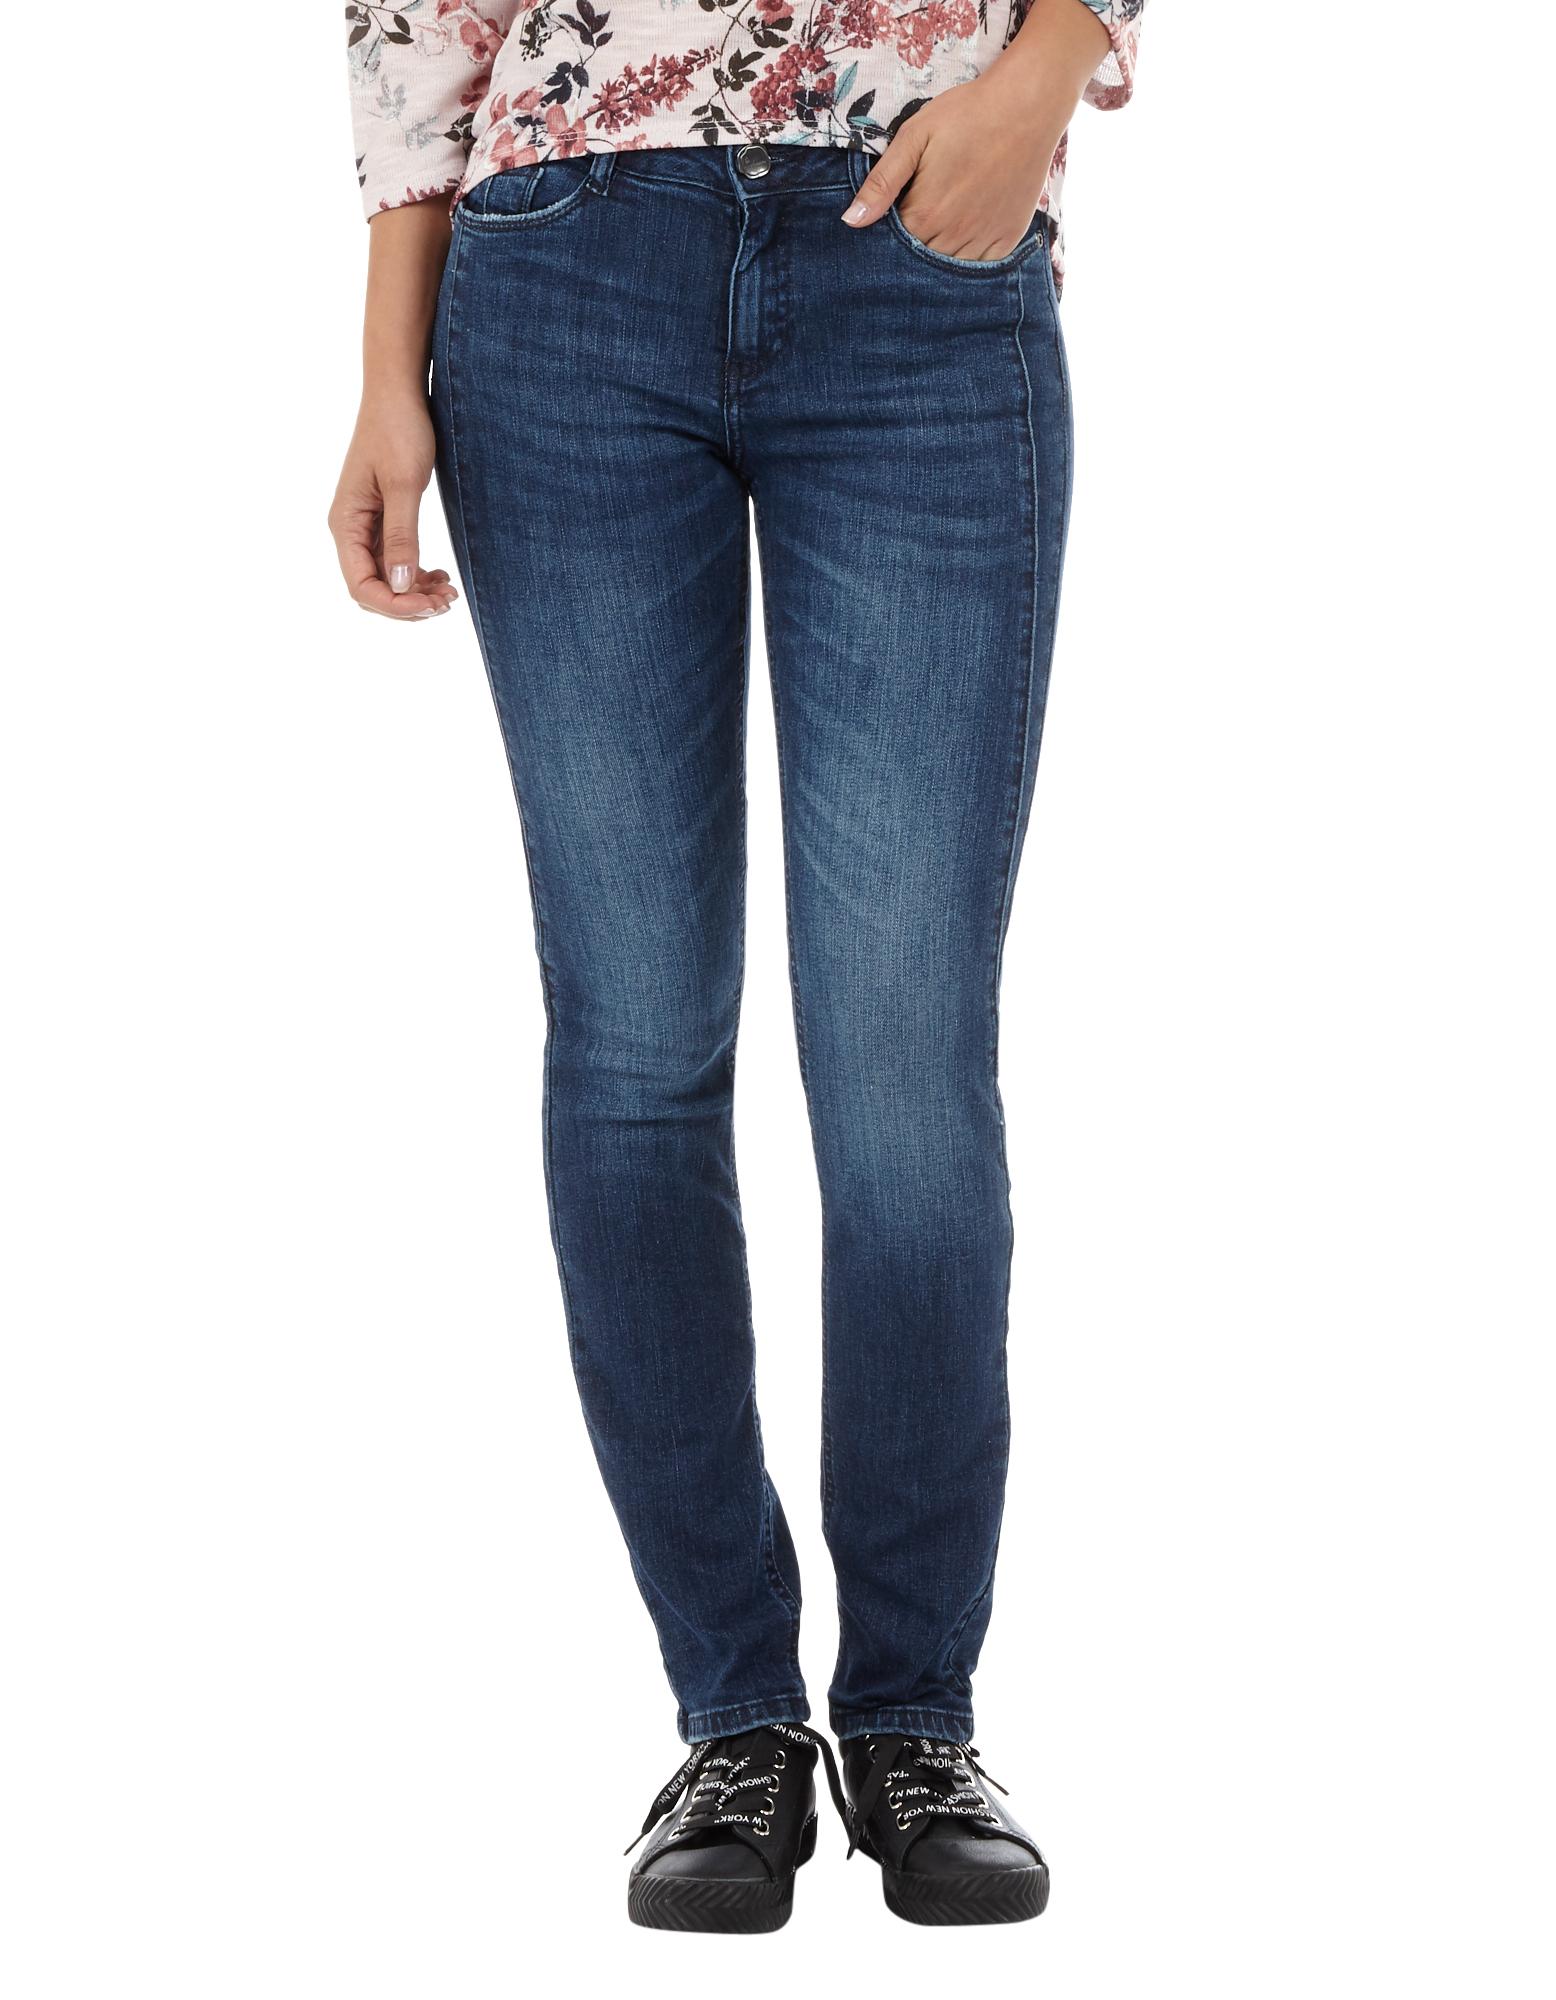 Damen Stone Washed Slim Fit Jeans - Takko Fashion